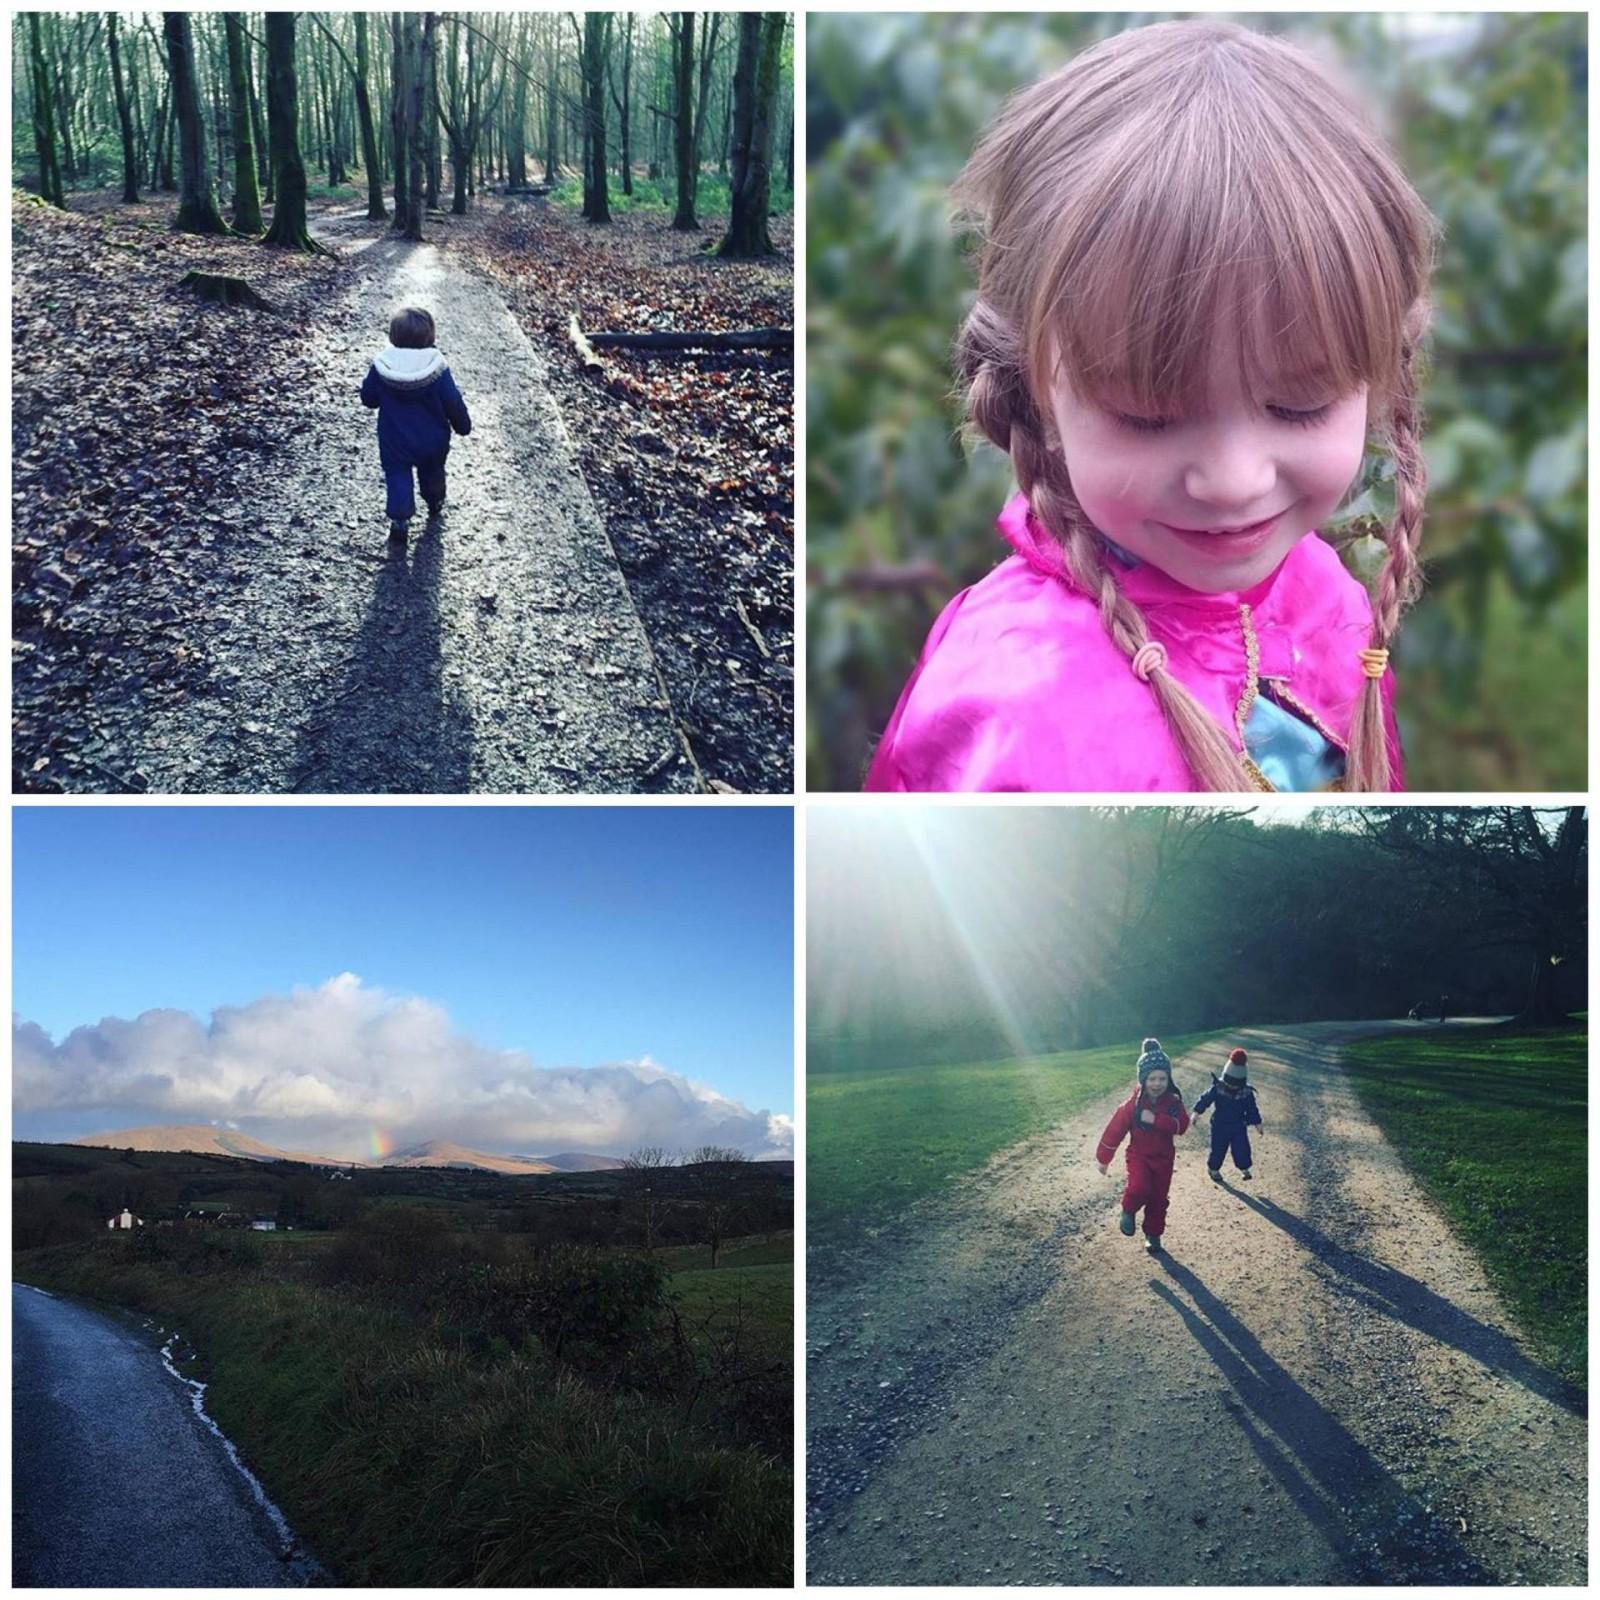 #366daysofpositive instagram community roundup